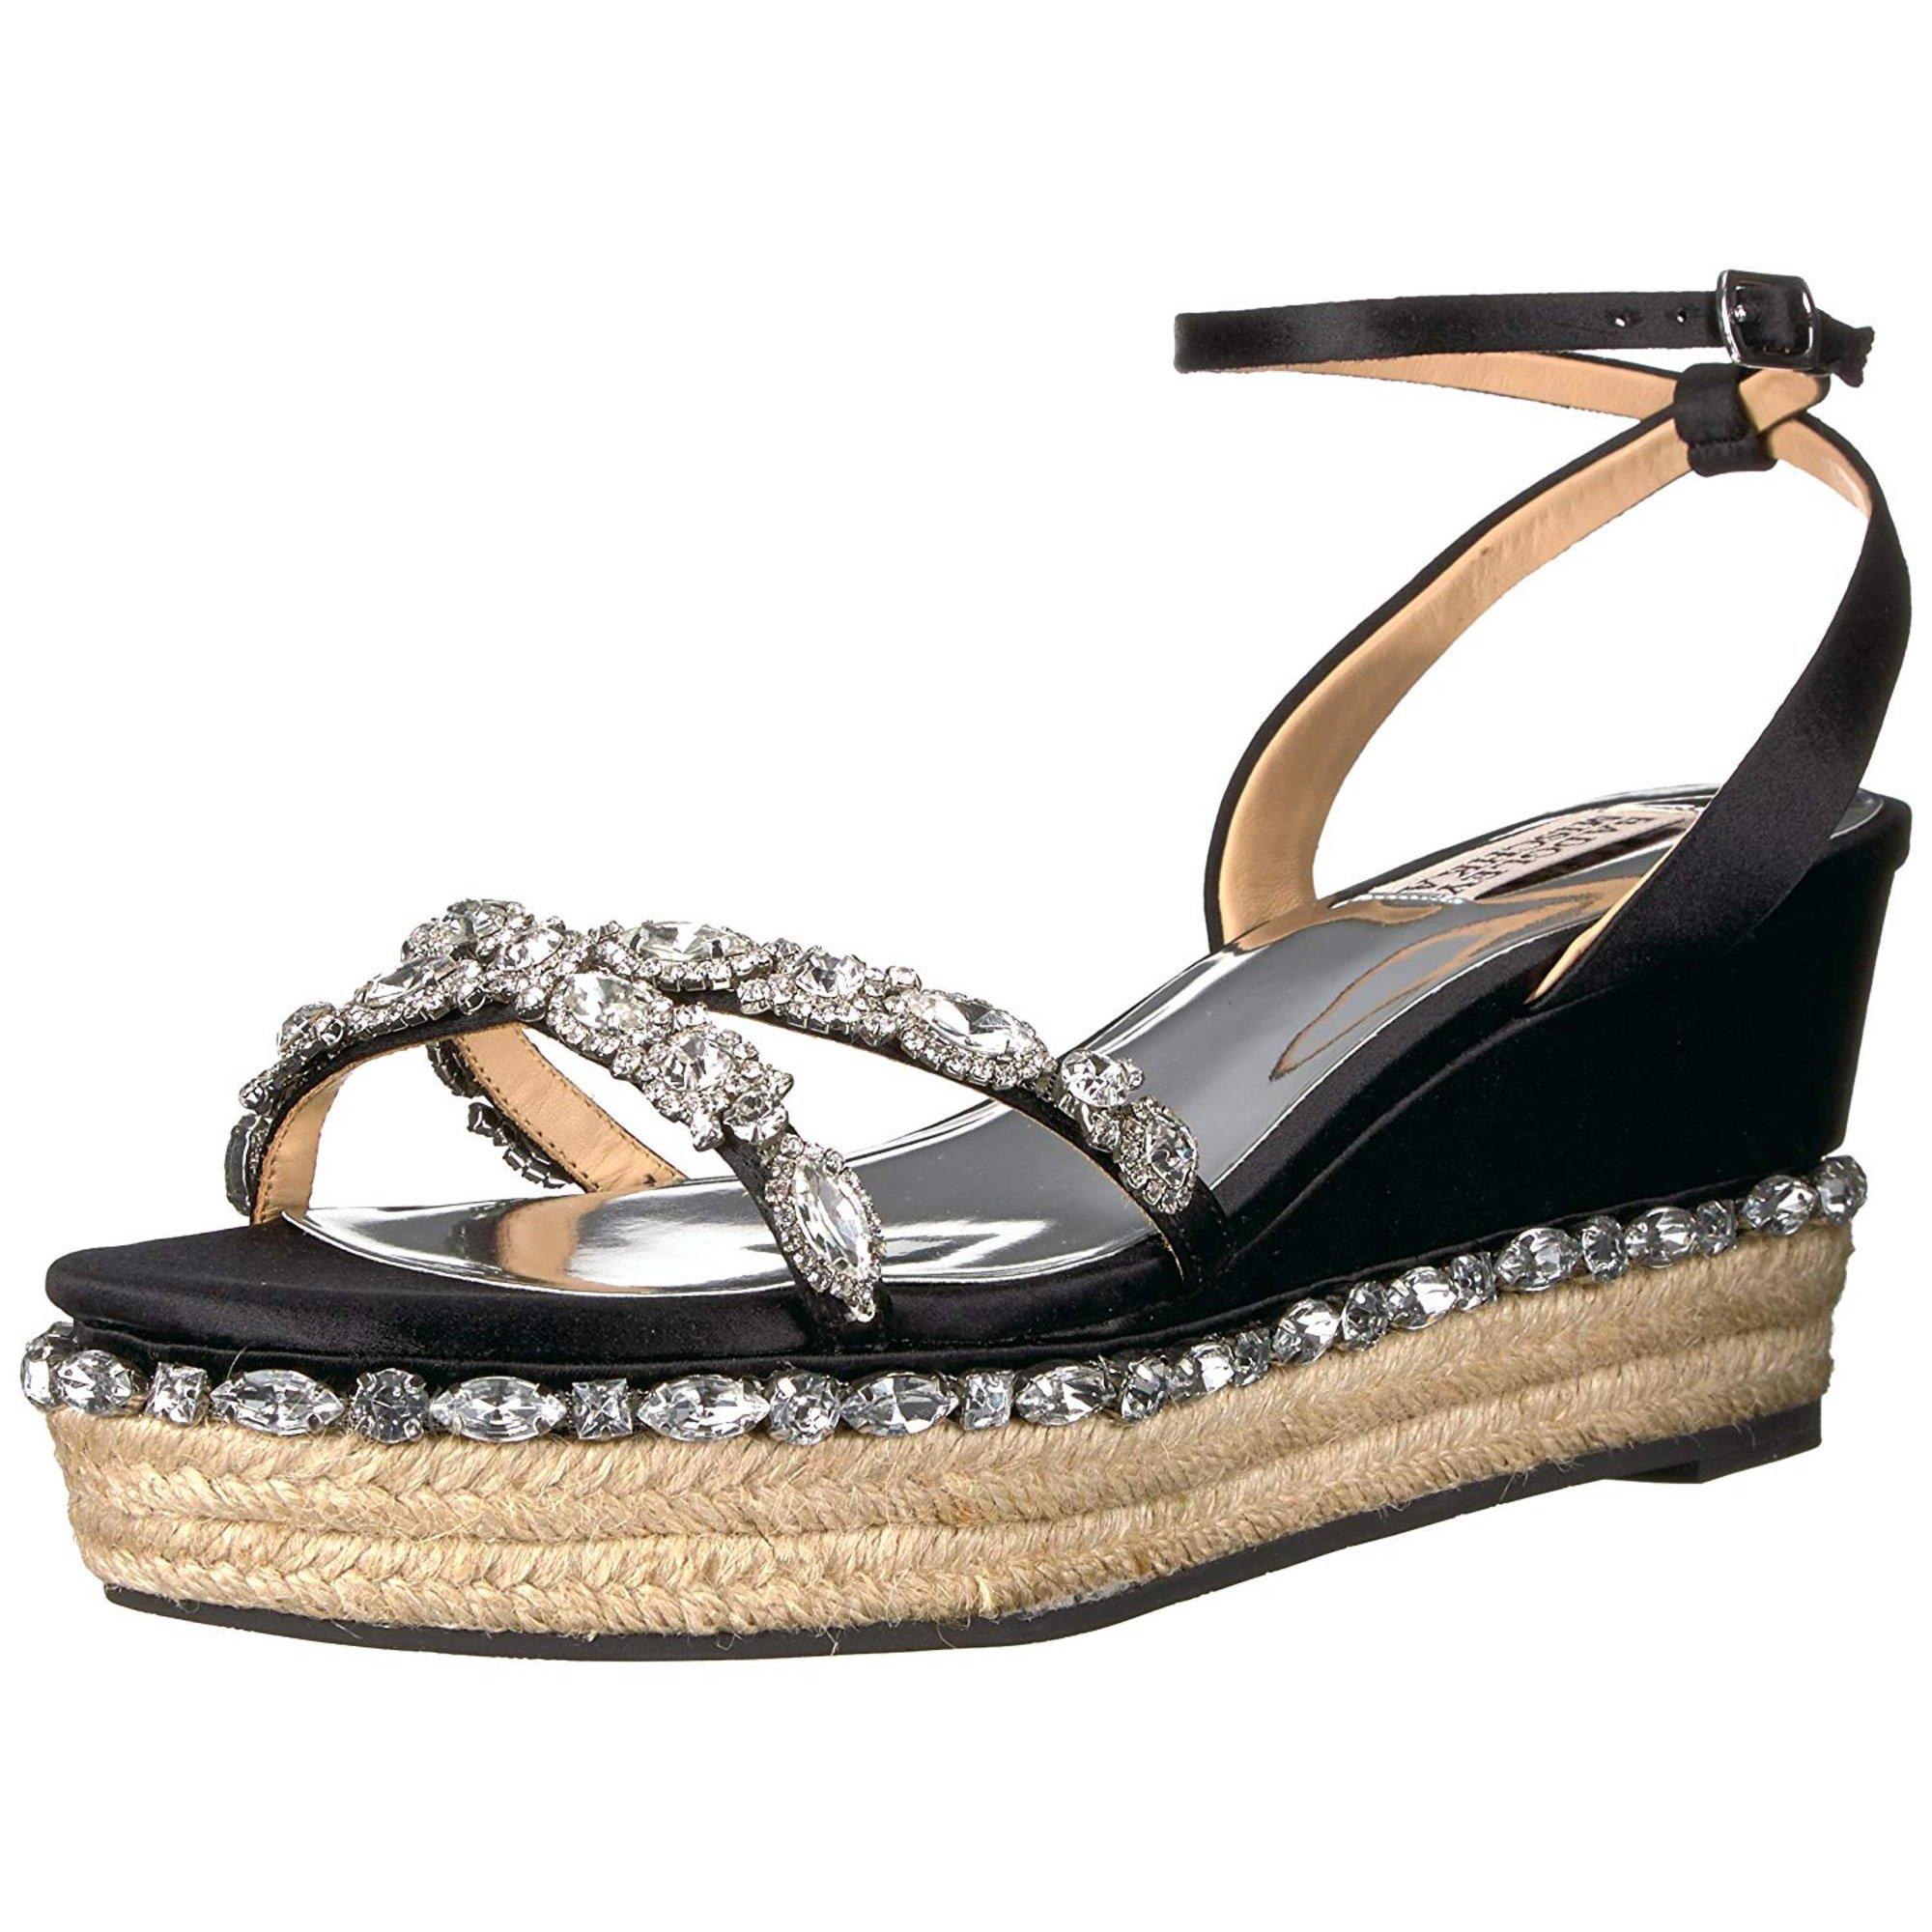 e3411b15fc3 Badgley Mischka Women's Silvie Espadrille Wedge Sandal